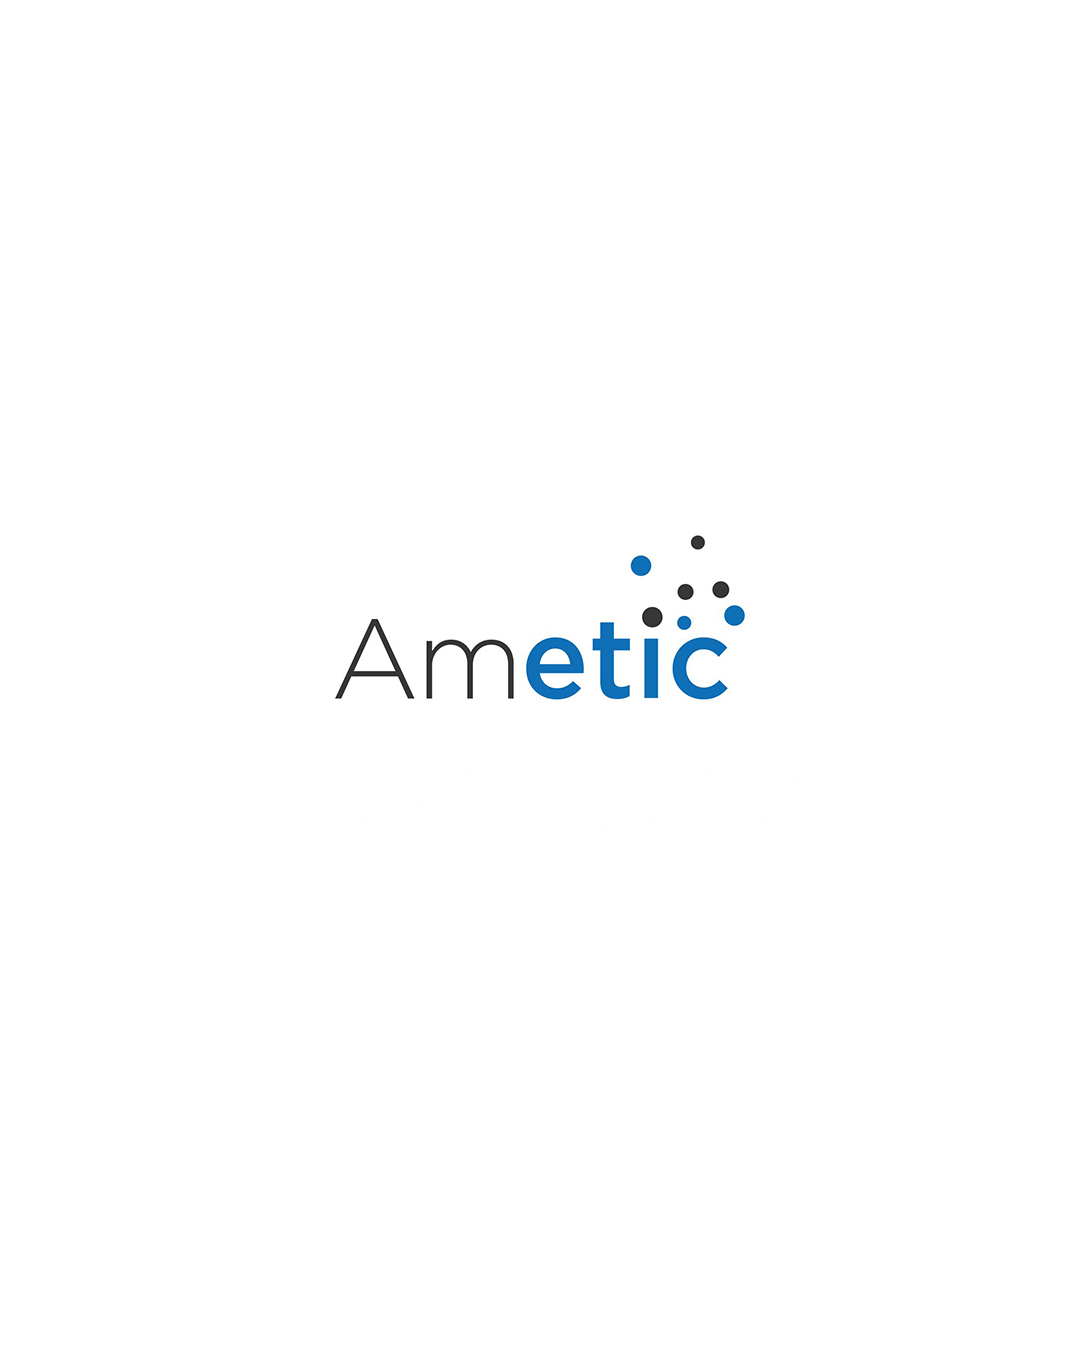 XAmetic